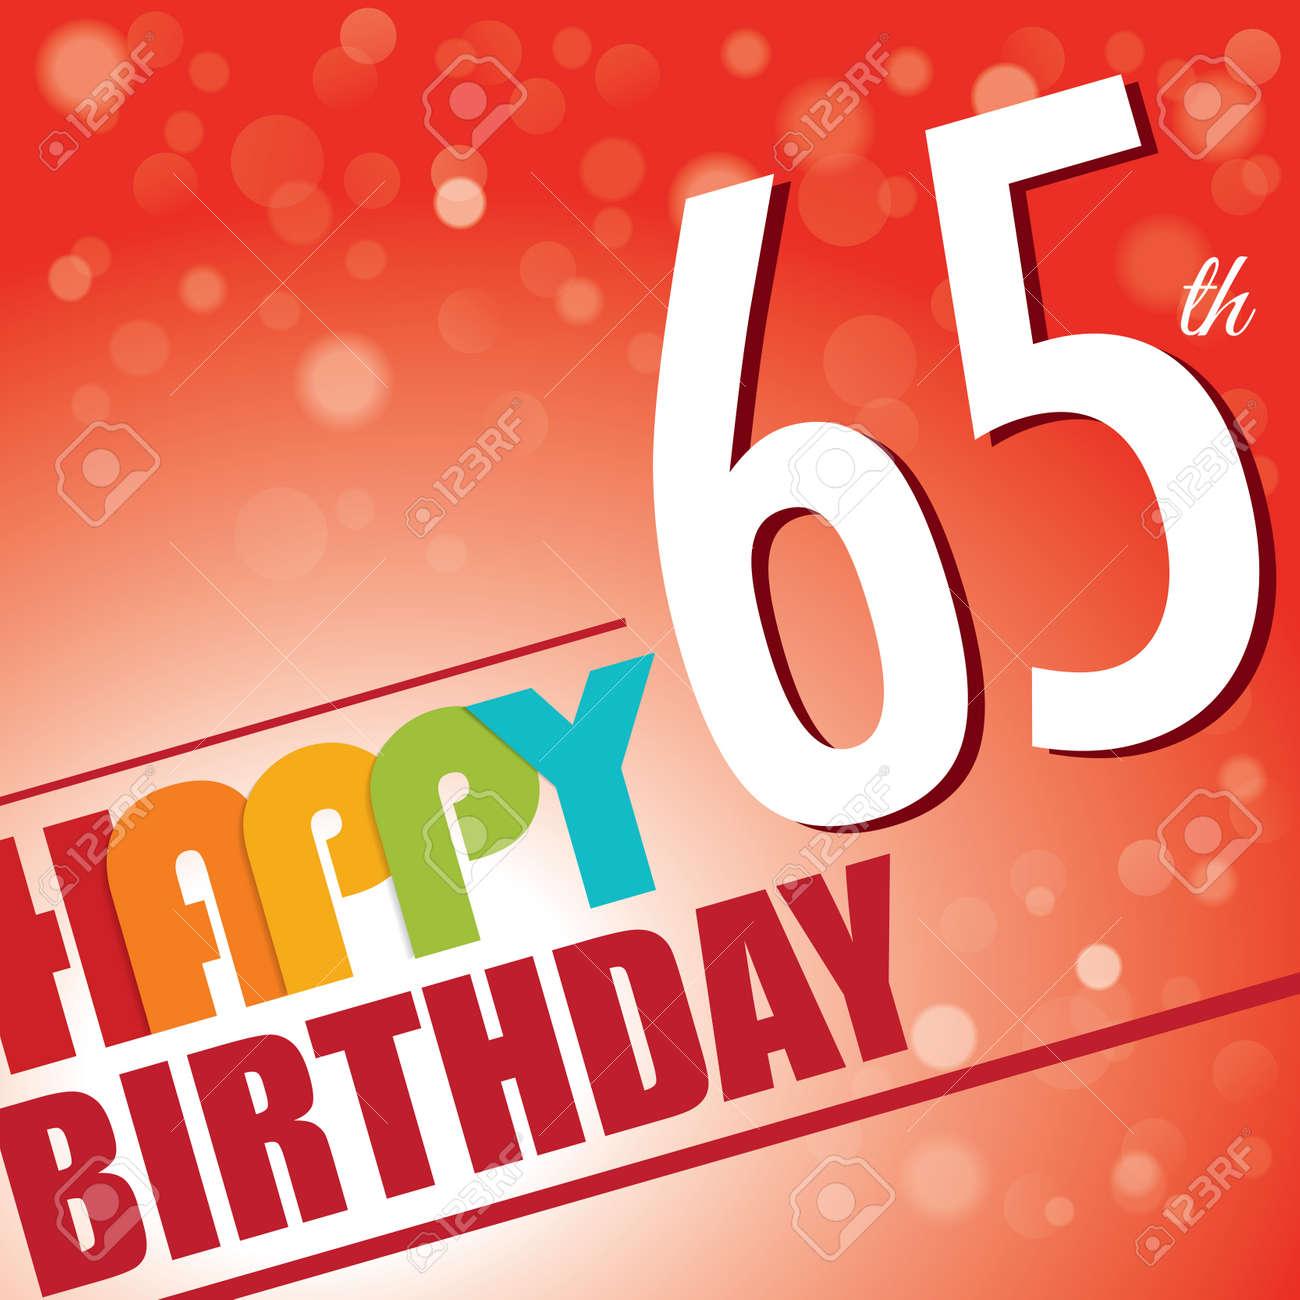 65th Birthday Party Invite Template Design In Bright And Colourful Retro Style